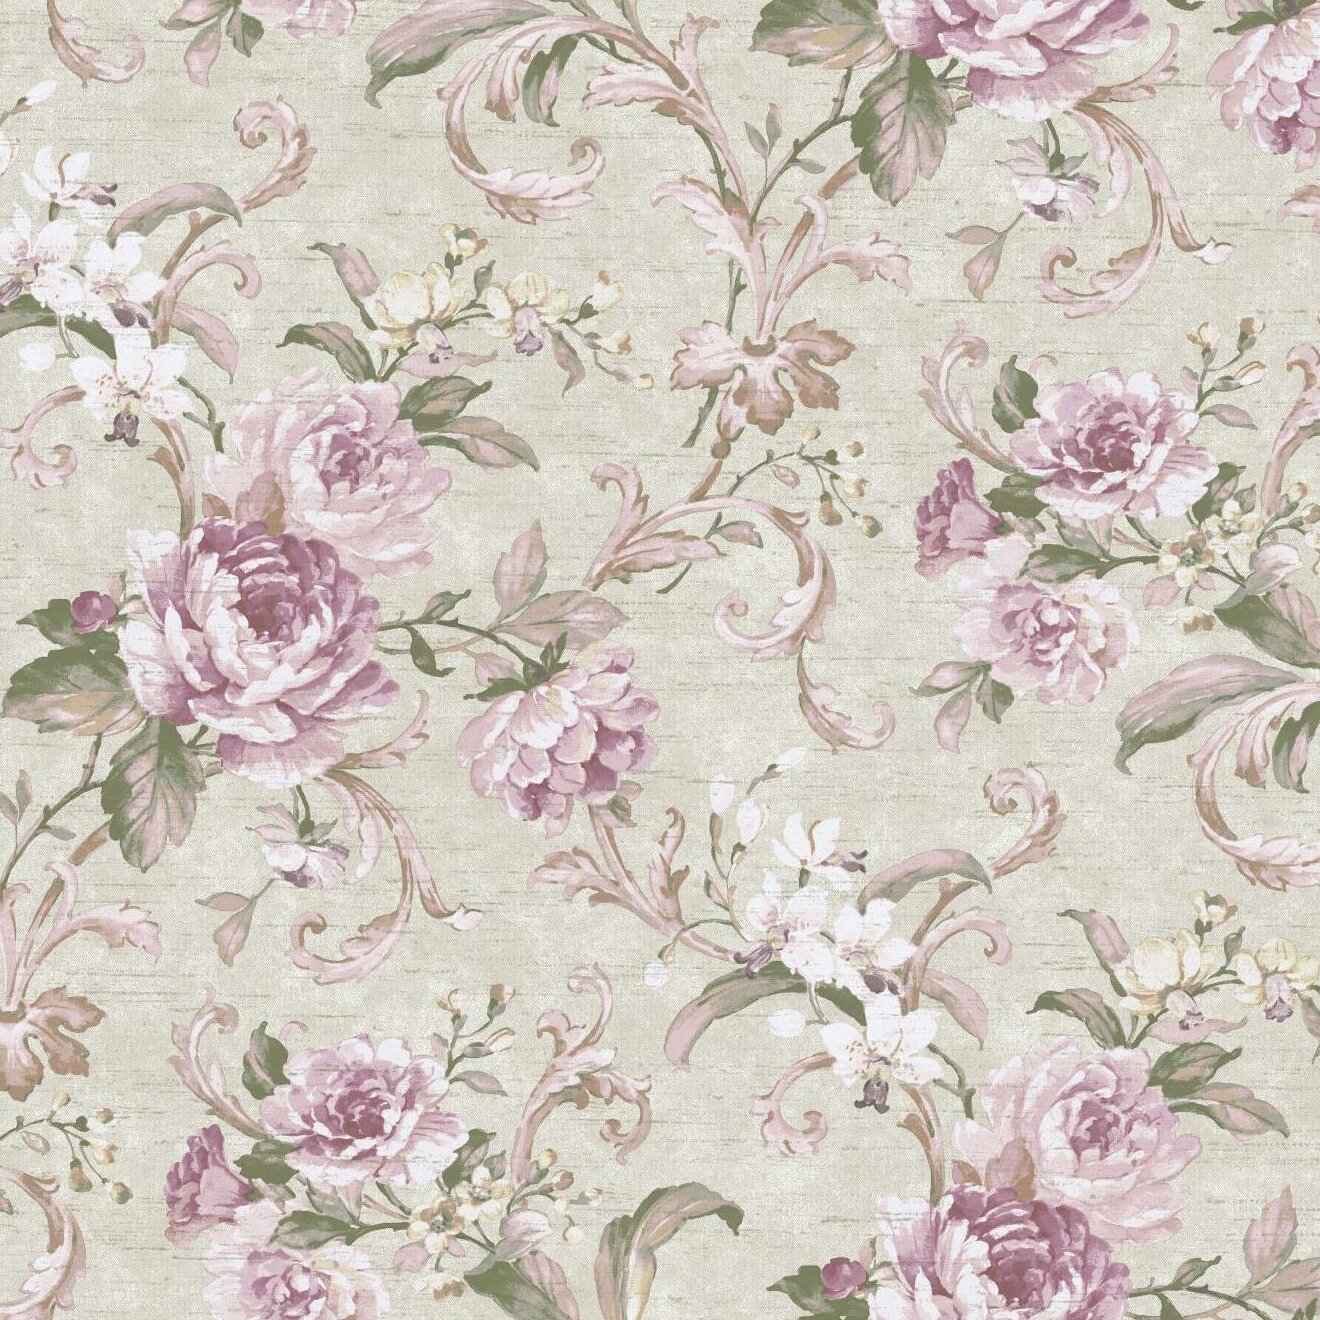 York Wallcoverings Luminous Lavender Floral Swirl Wallpaper Roll